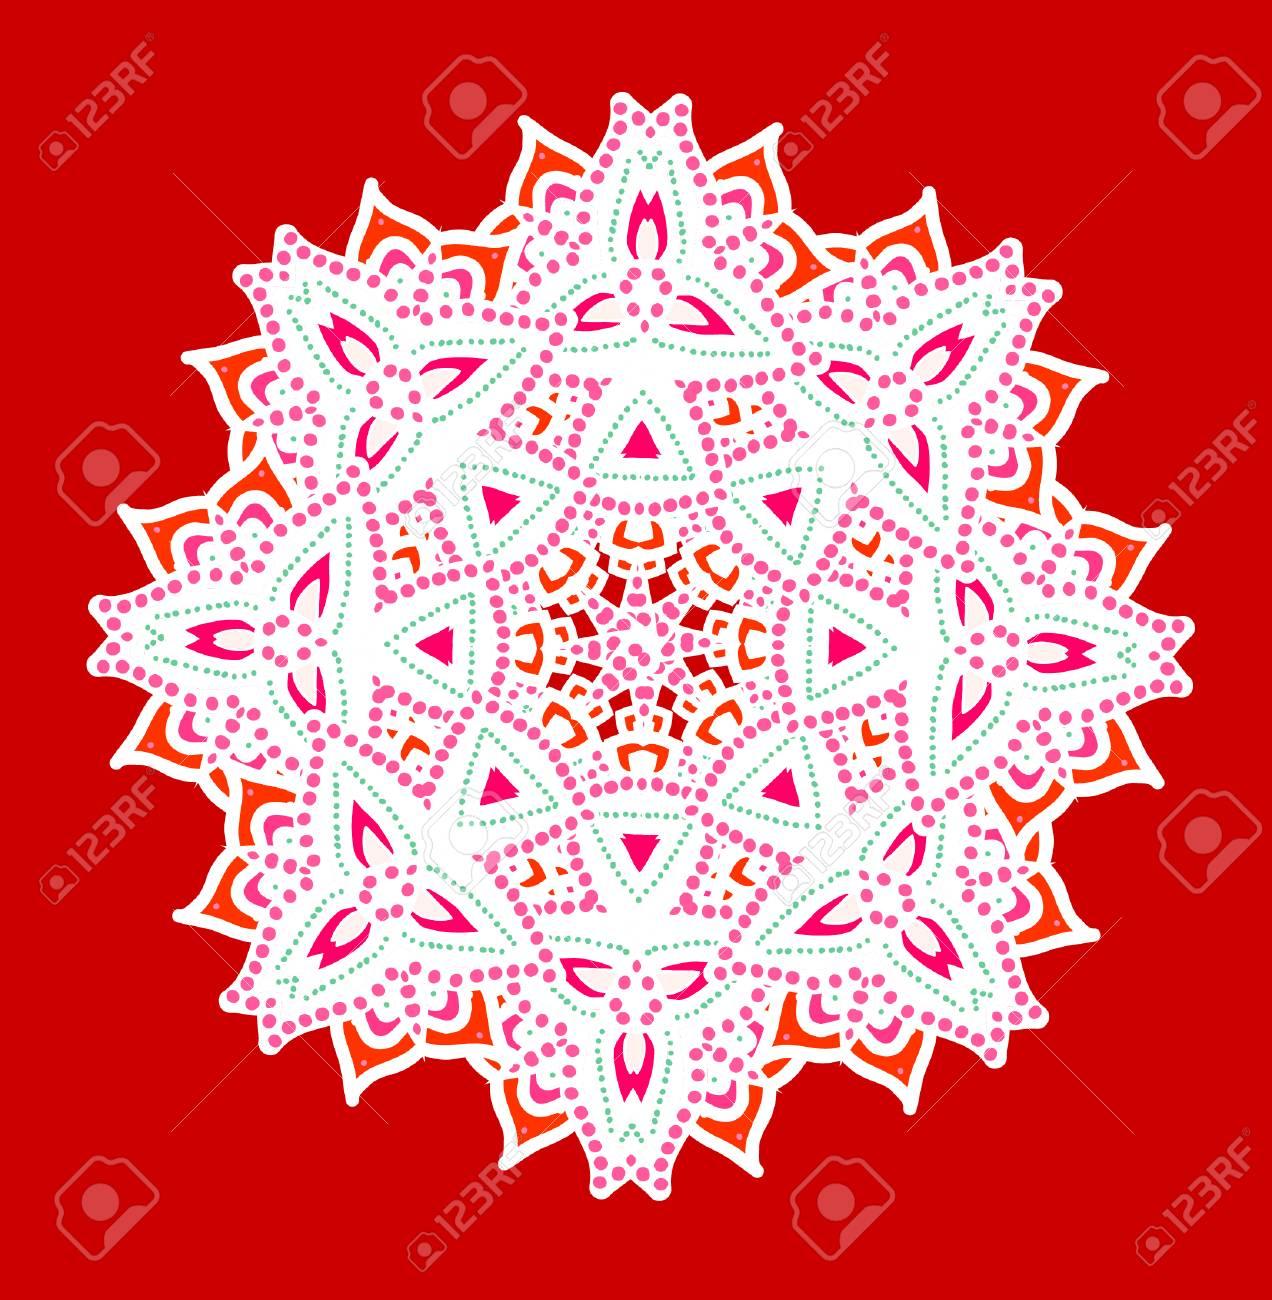 Ornamental Card With Mandala. Vintage Decorative Elements. Royalty ...